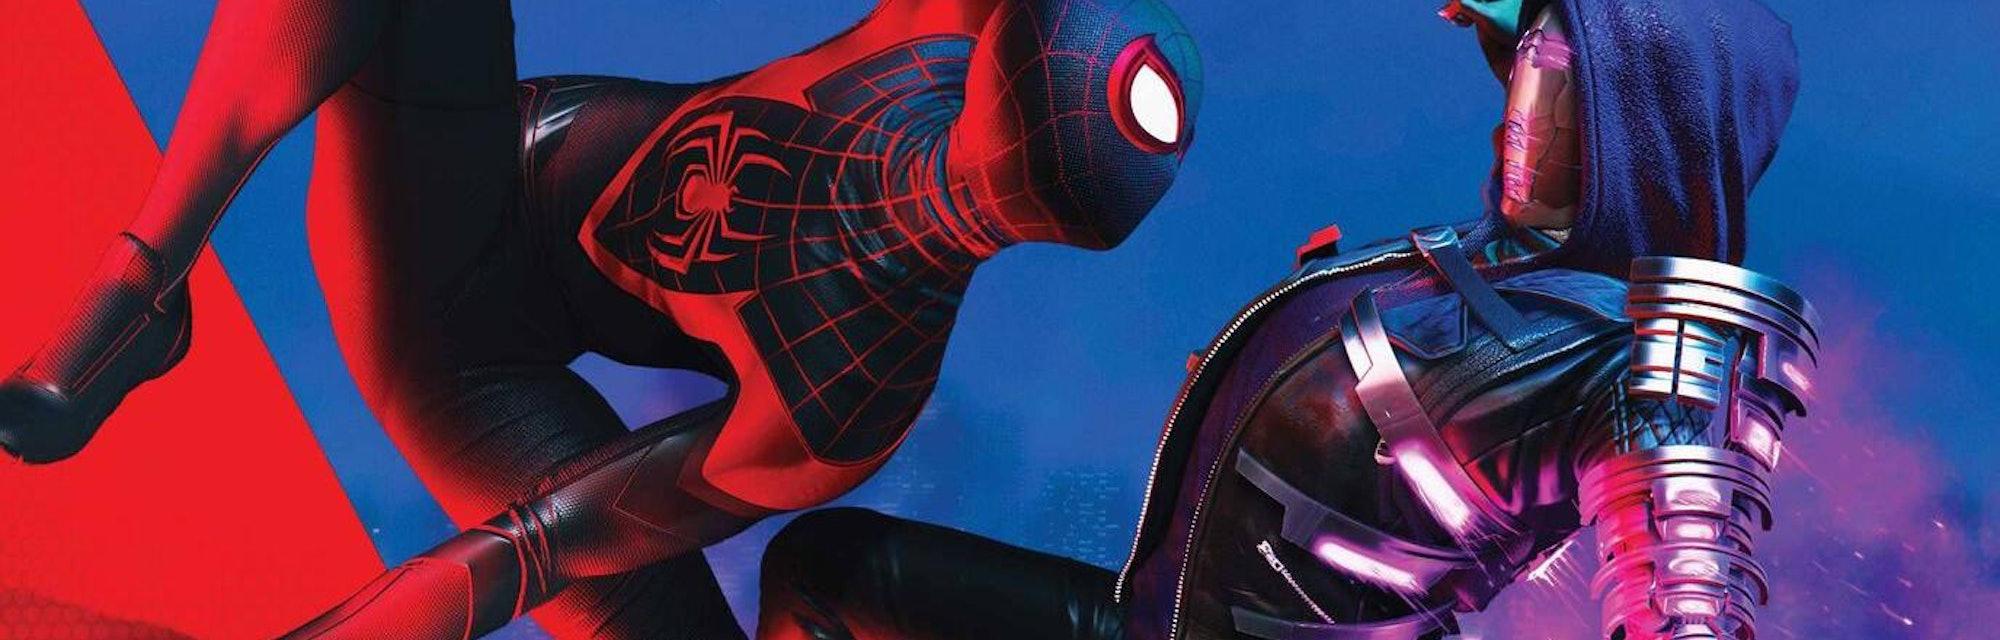 amazing spider-man #54 variant cover